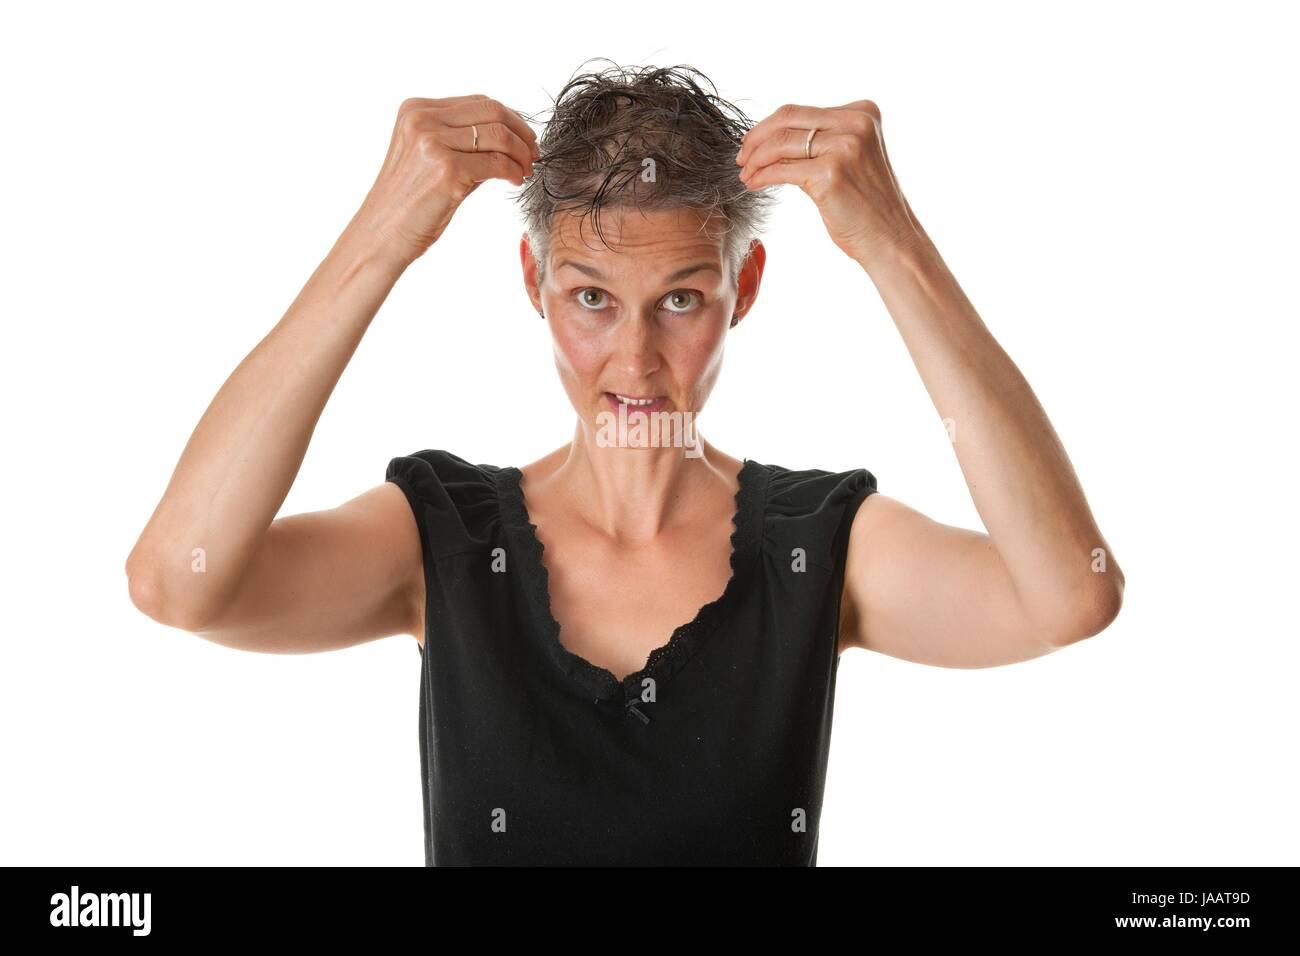 haarausfall haarverlust graue haare haare haar wechseljahre